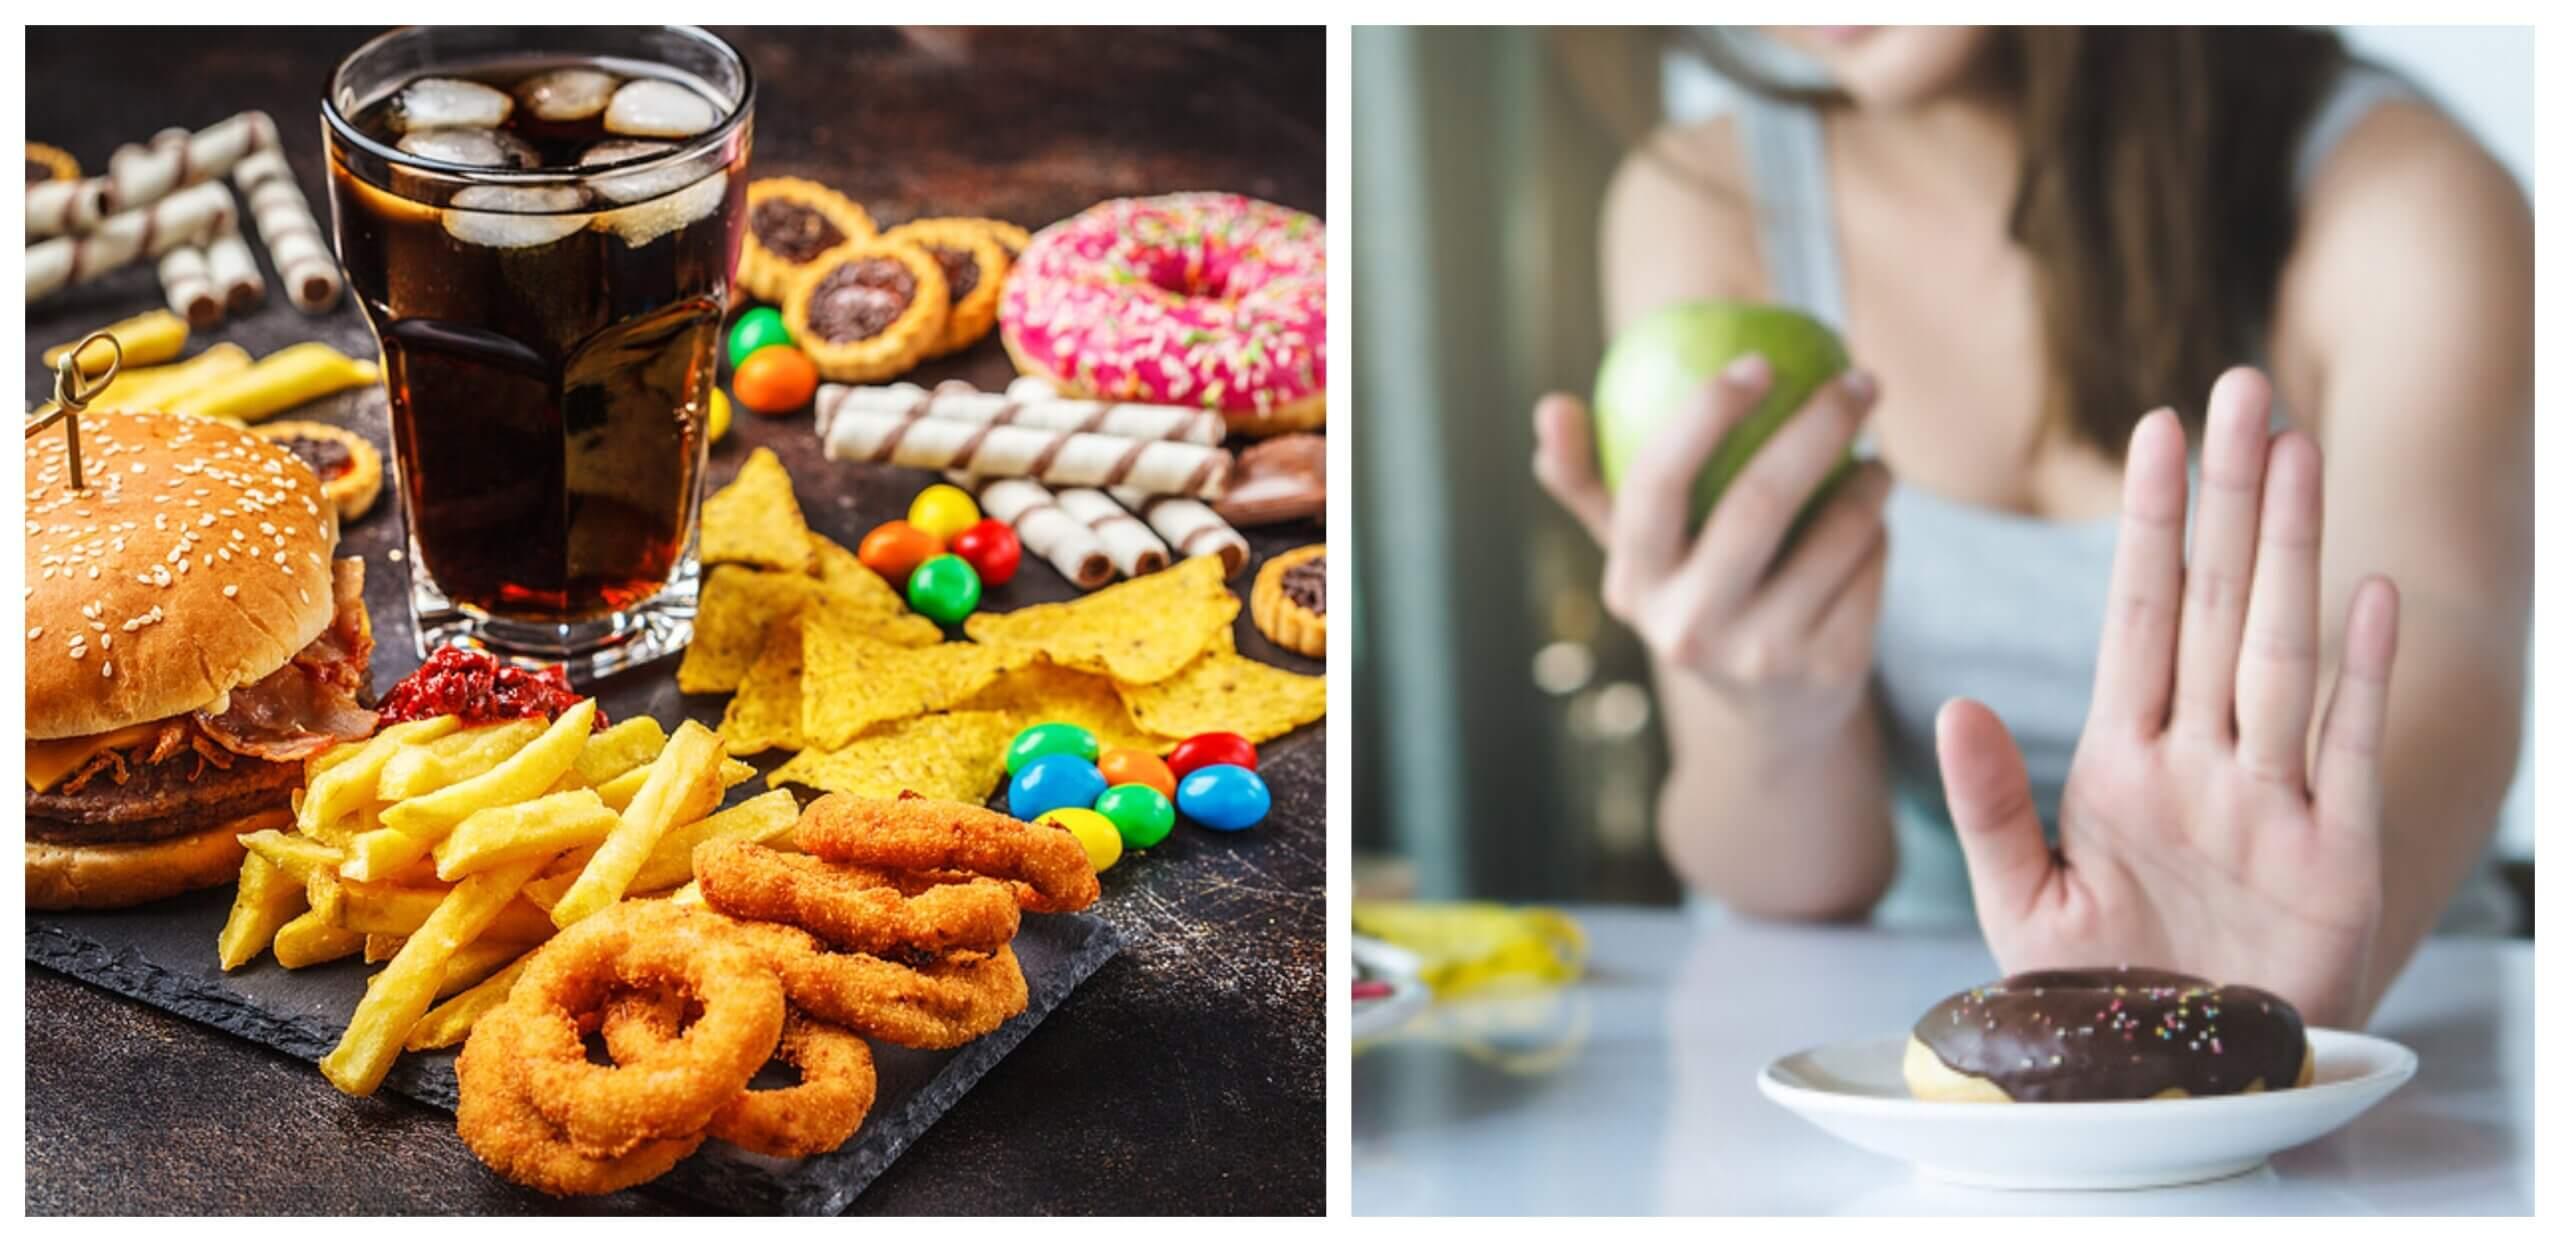 8 alimentos que debes evitar para tener un hígado sano